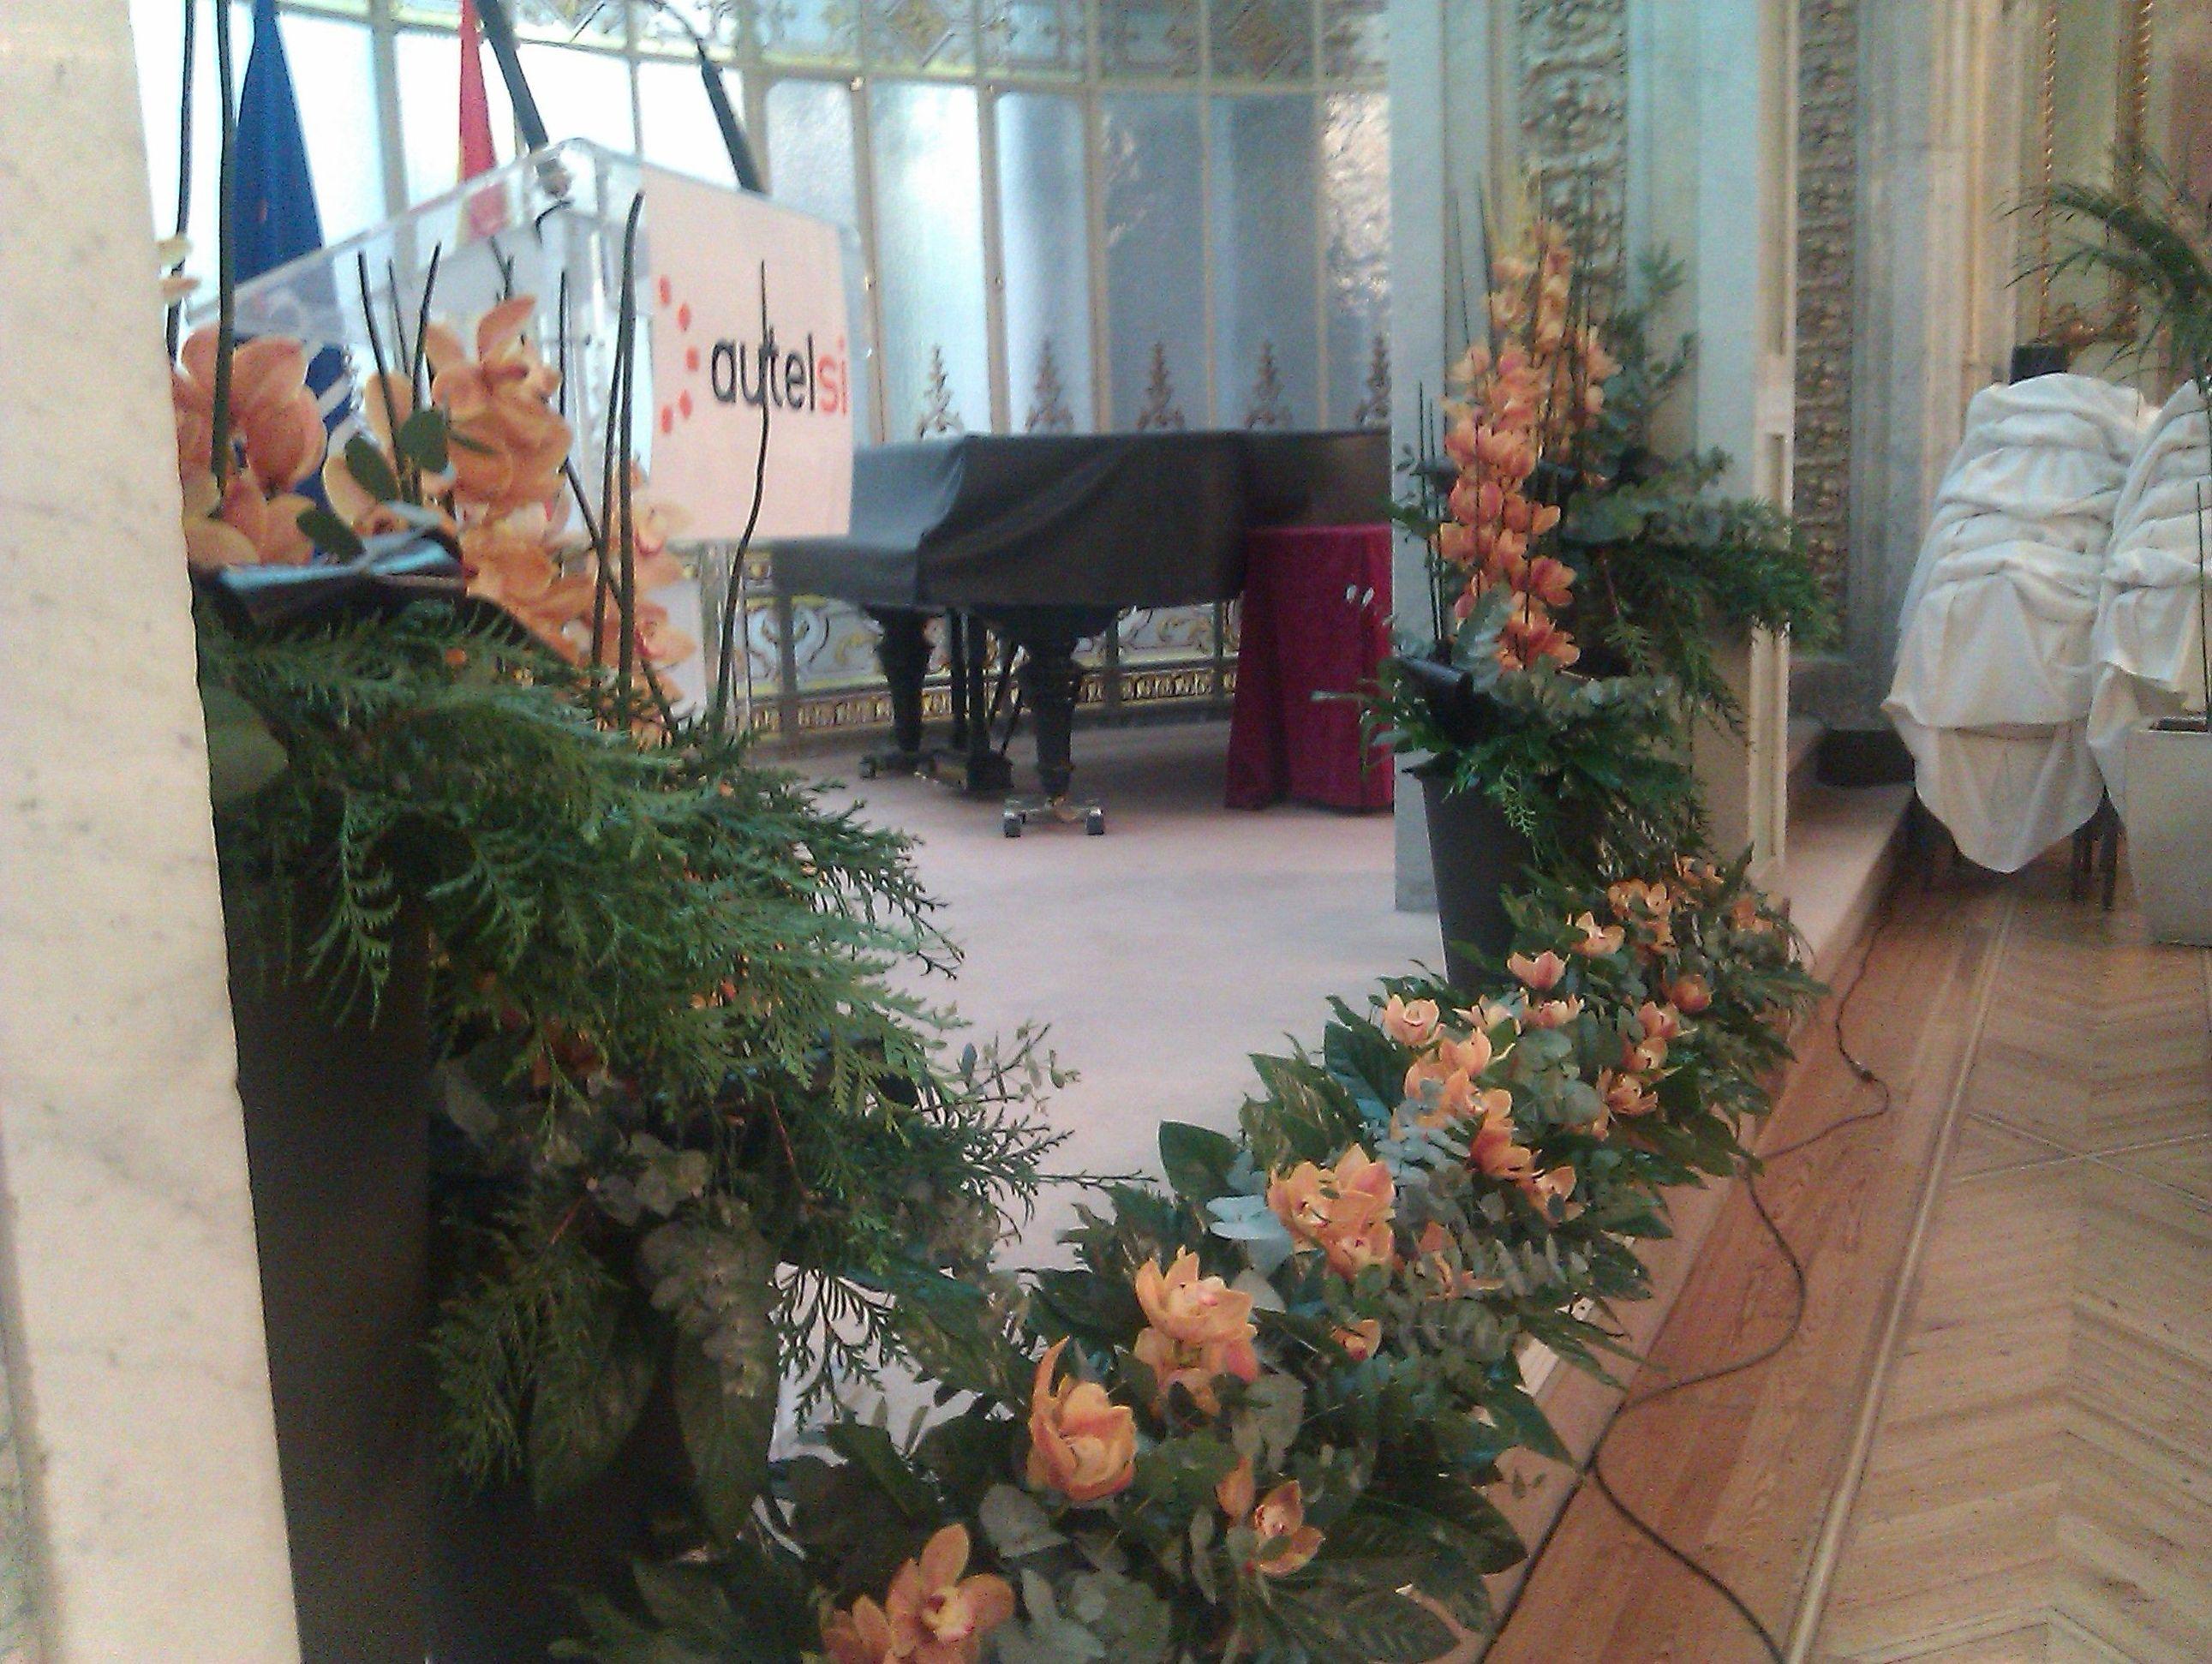 Decoración de eventos con flores